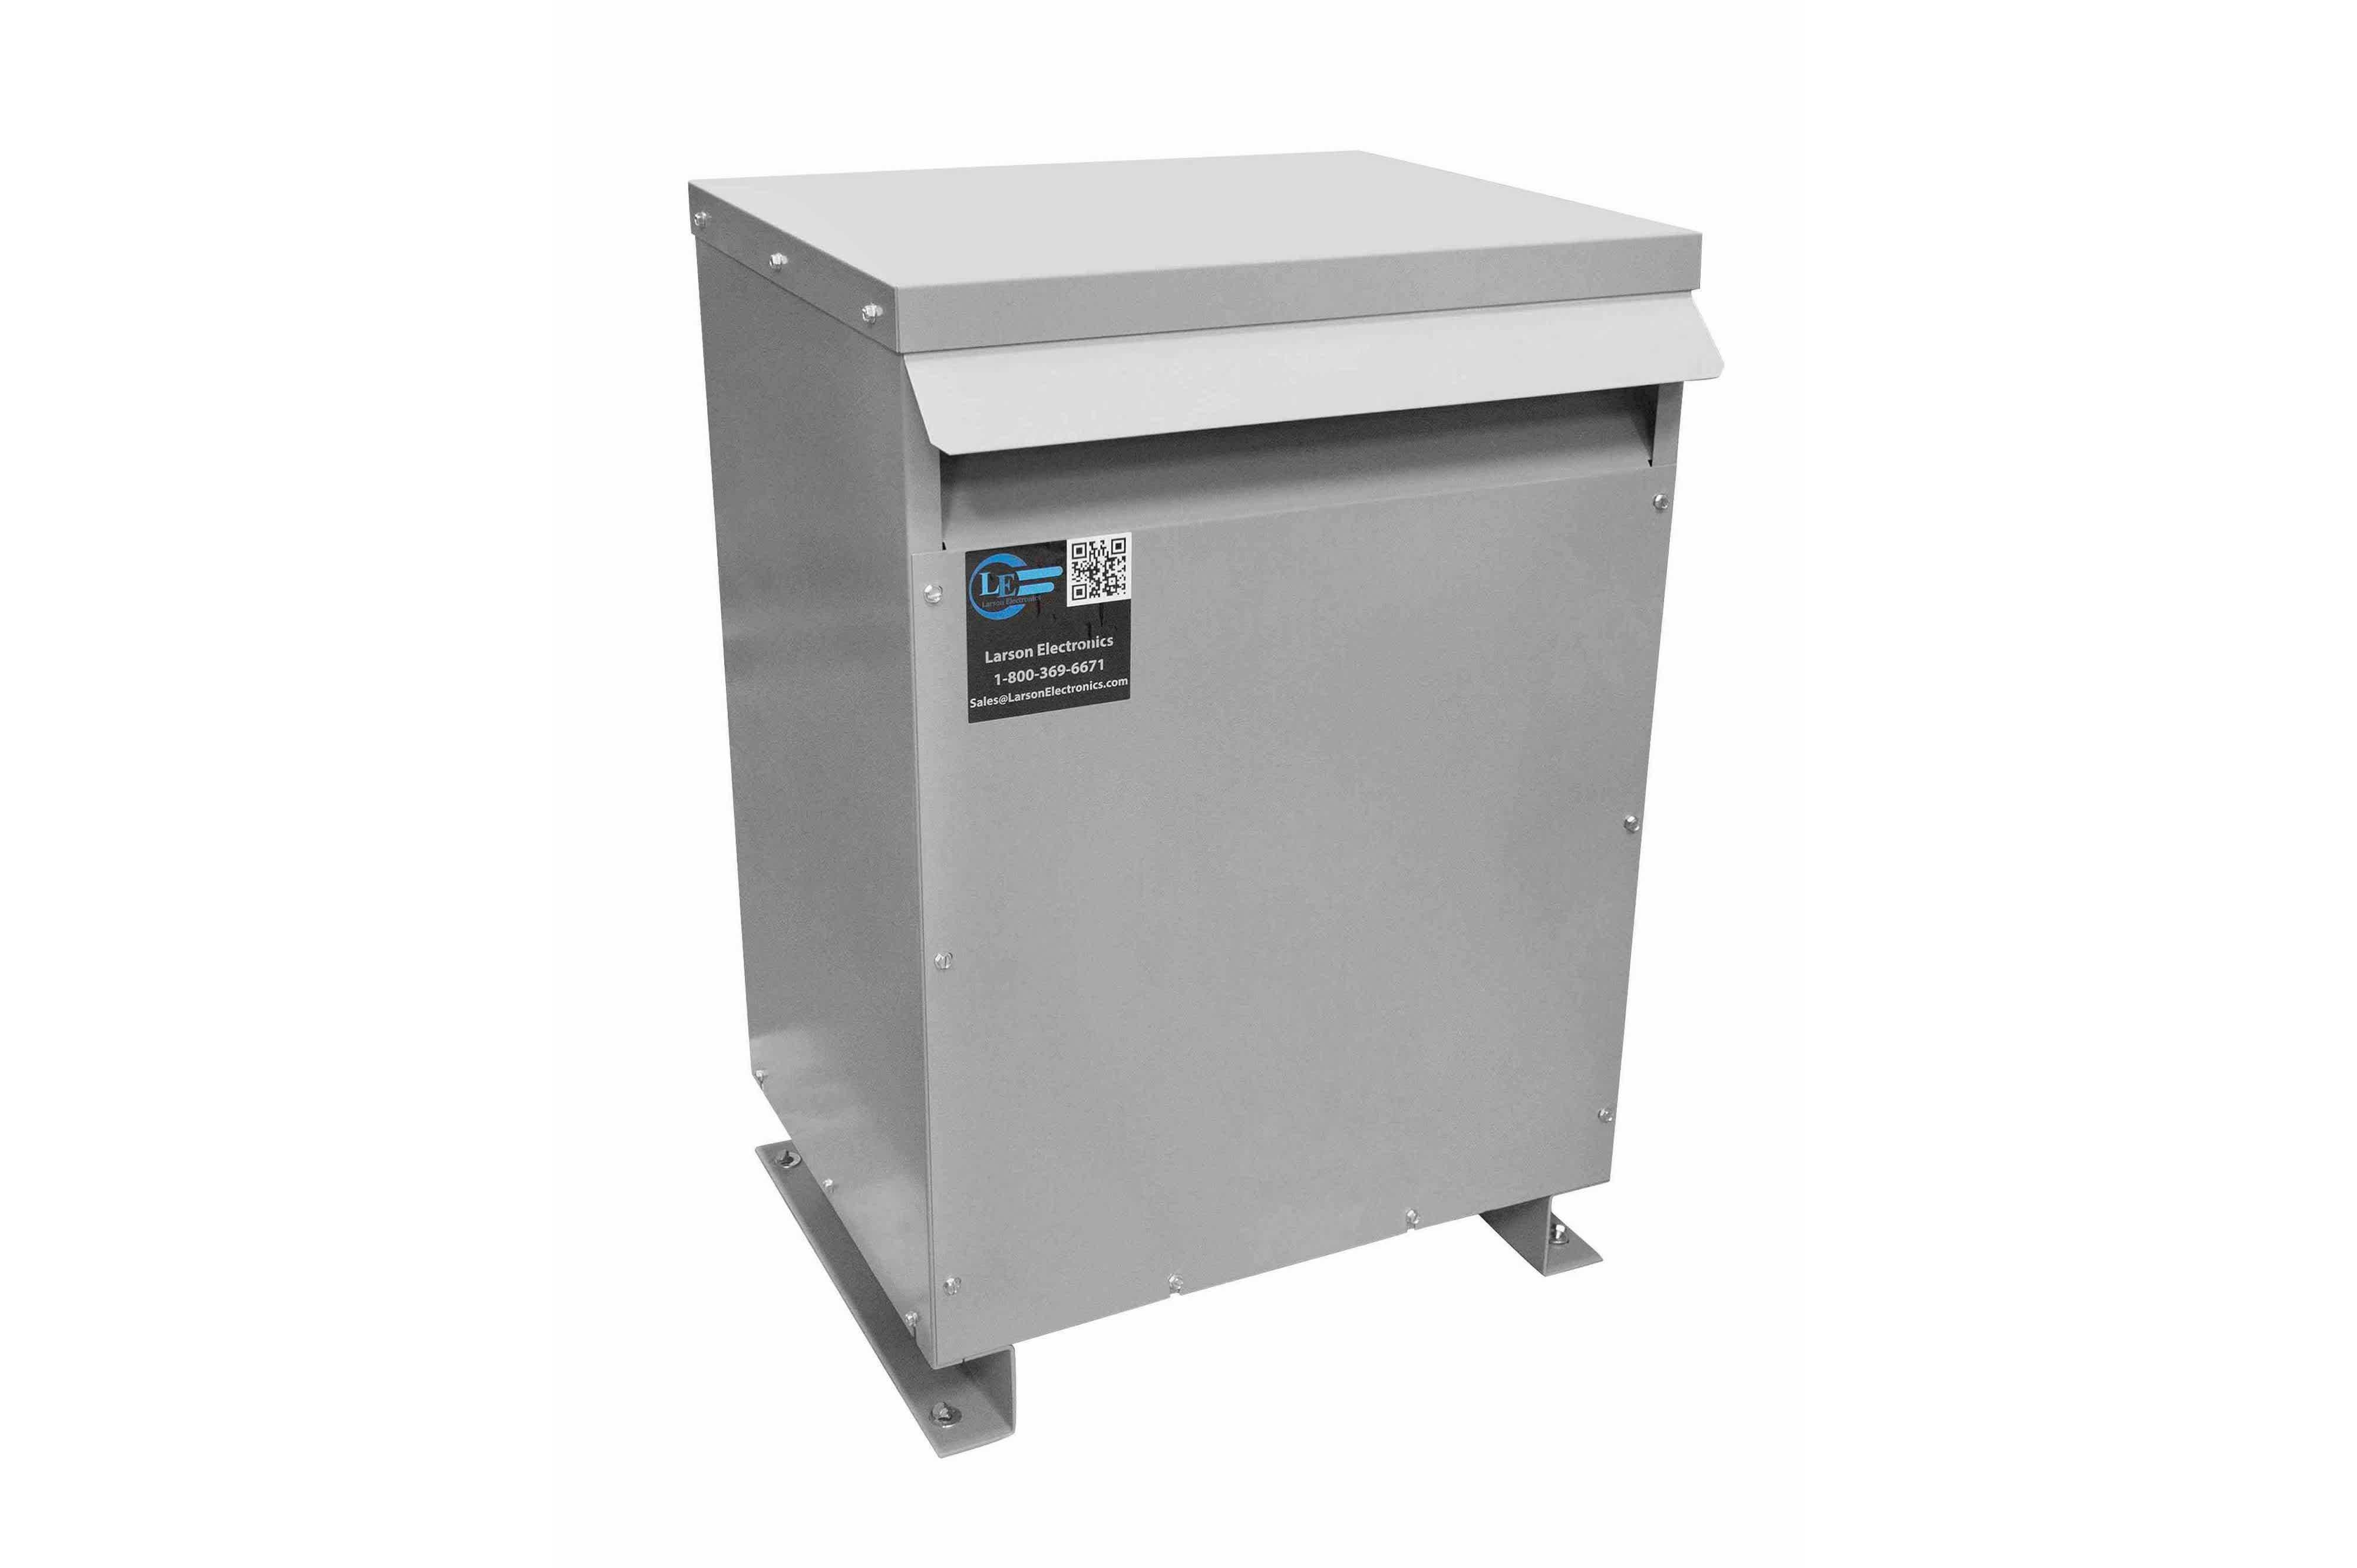 11 kVA 3PH Isolation Transformer, 480V Wye Primary, 380V Delta Secondary, N3R, Ventilated, 60 Hz